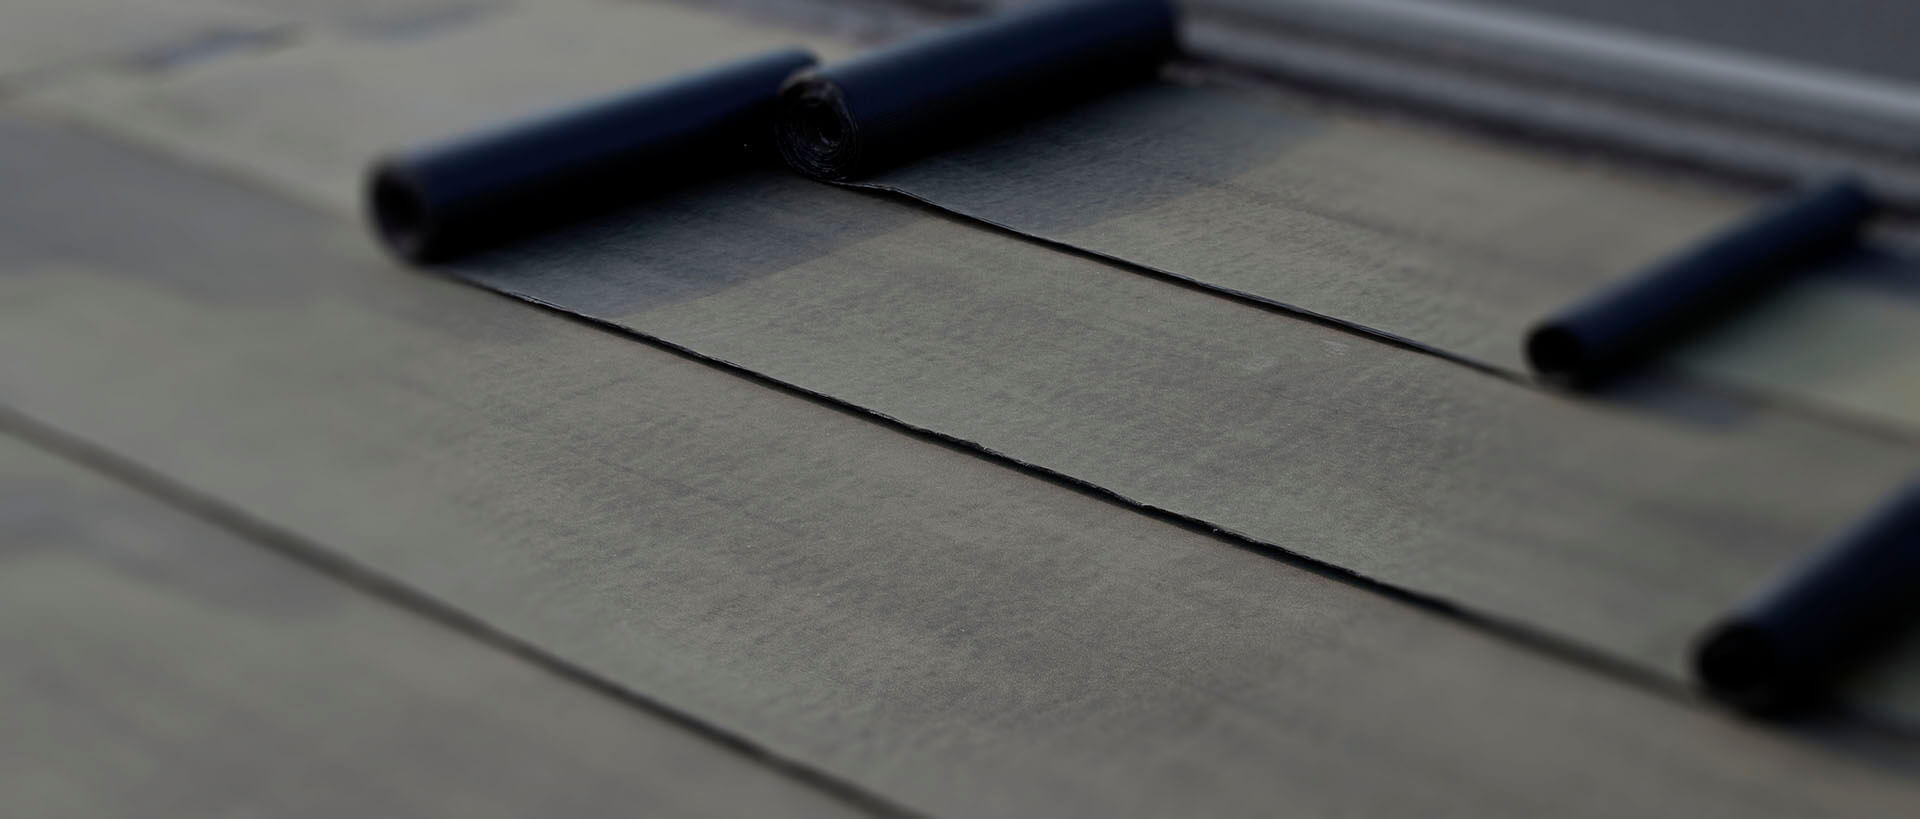 Slider blurred rubber roofs